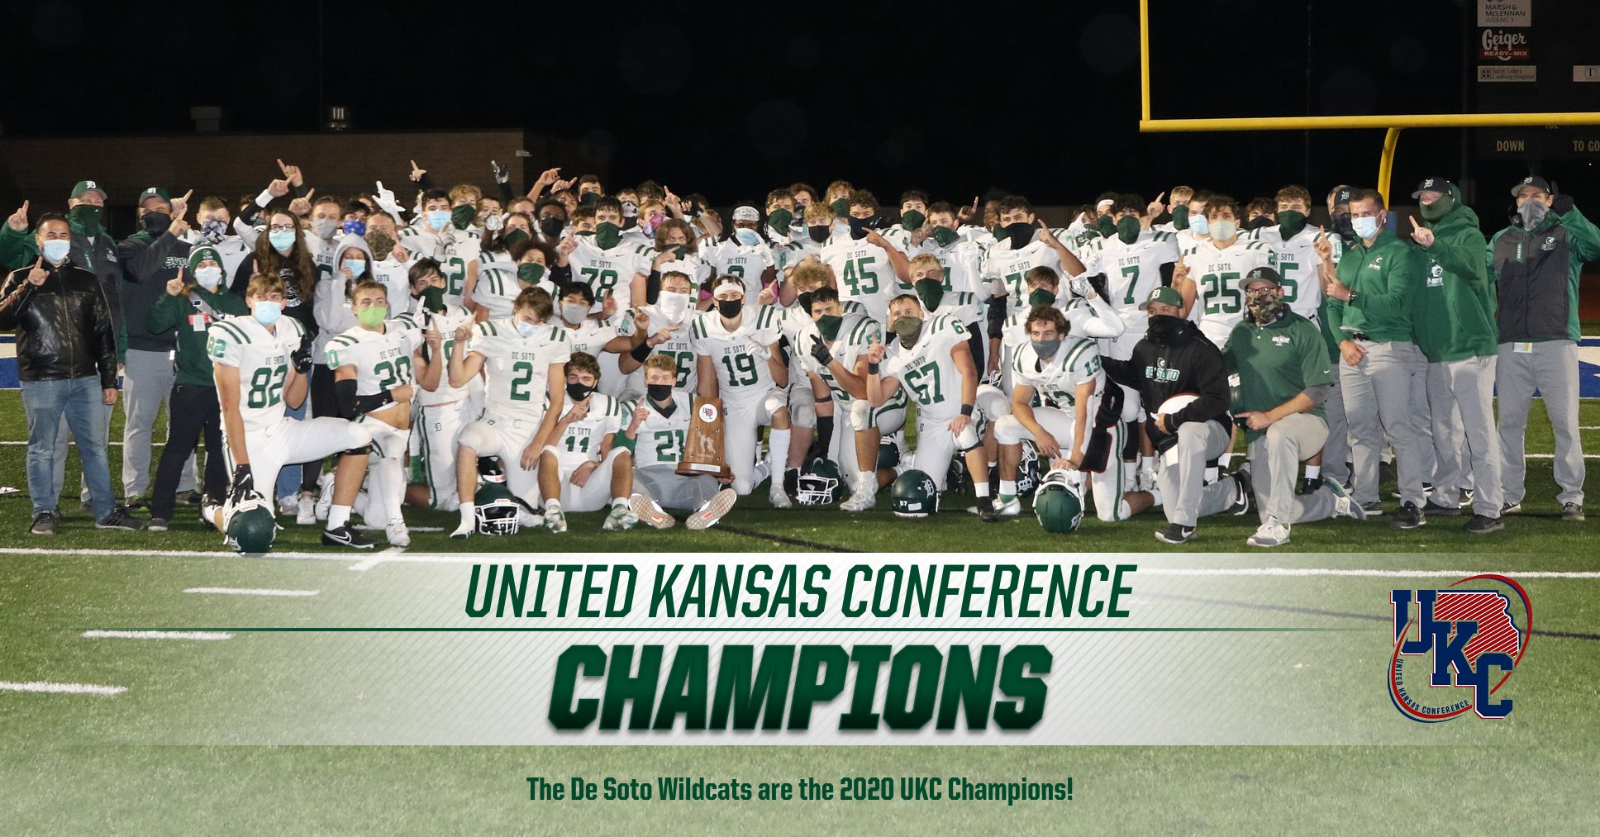 United Kansas Conference Champions